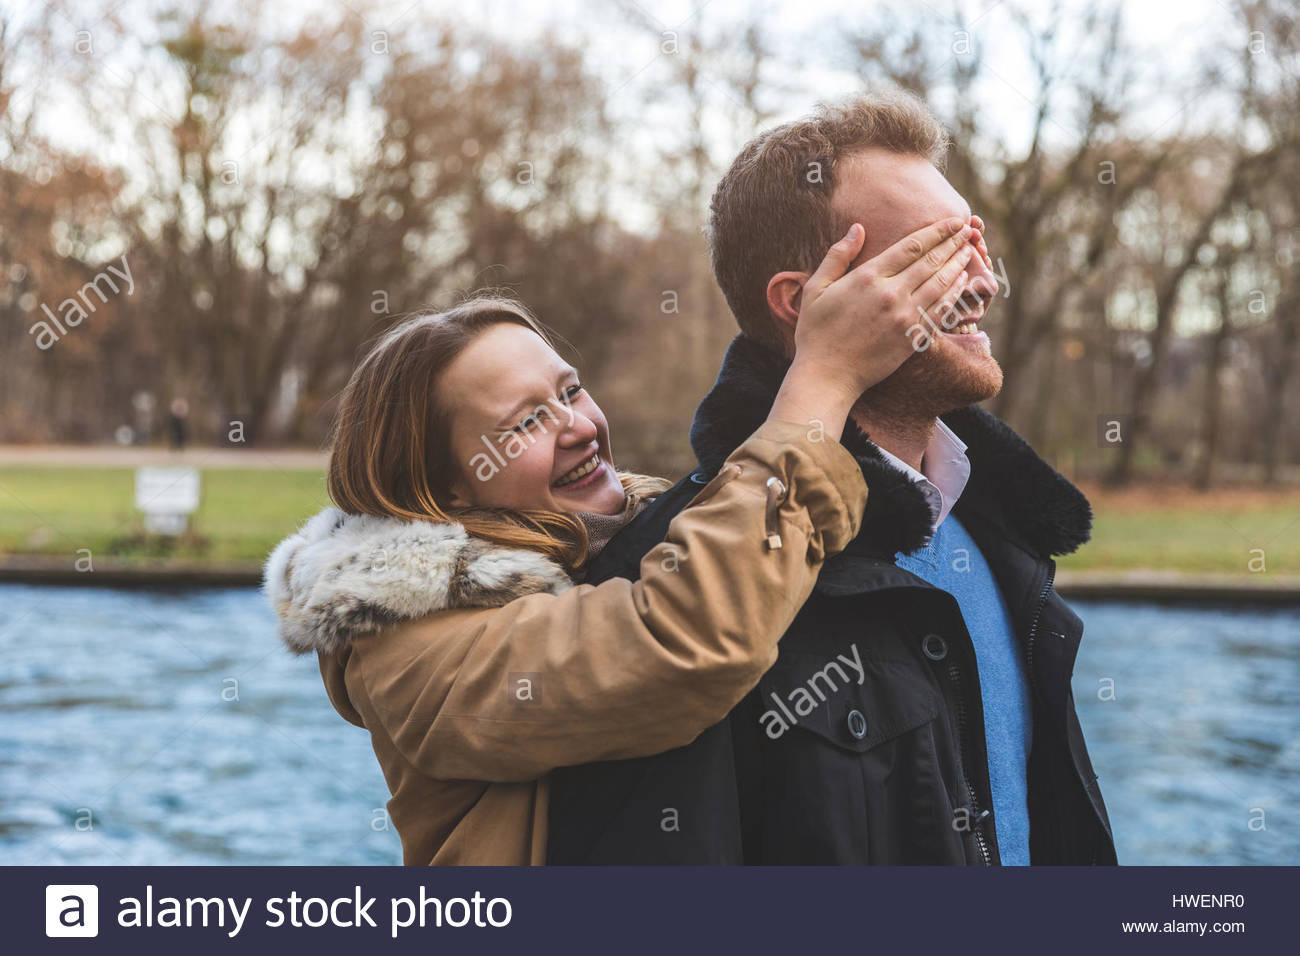 Junge Frau für Freundes Augen am Park am Flussufer Stockbild